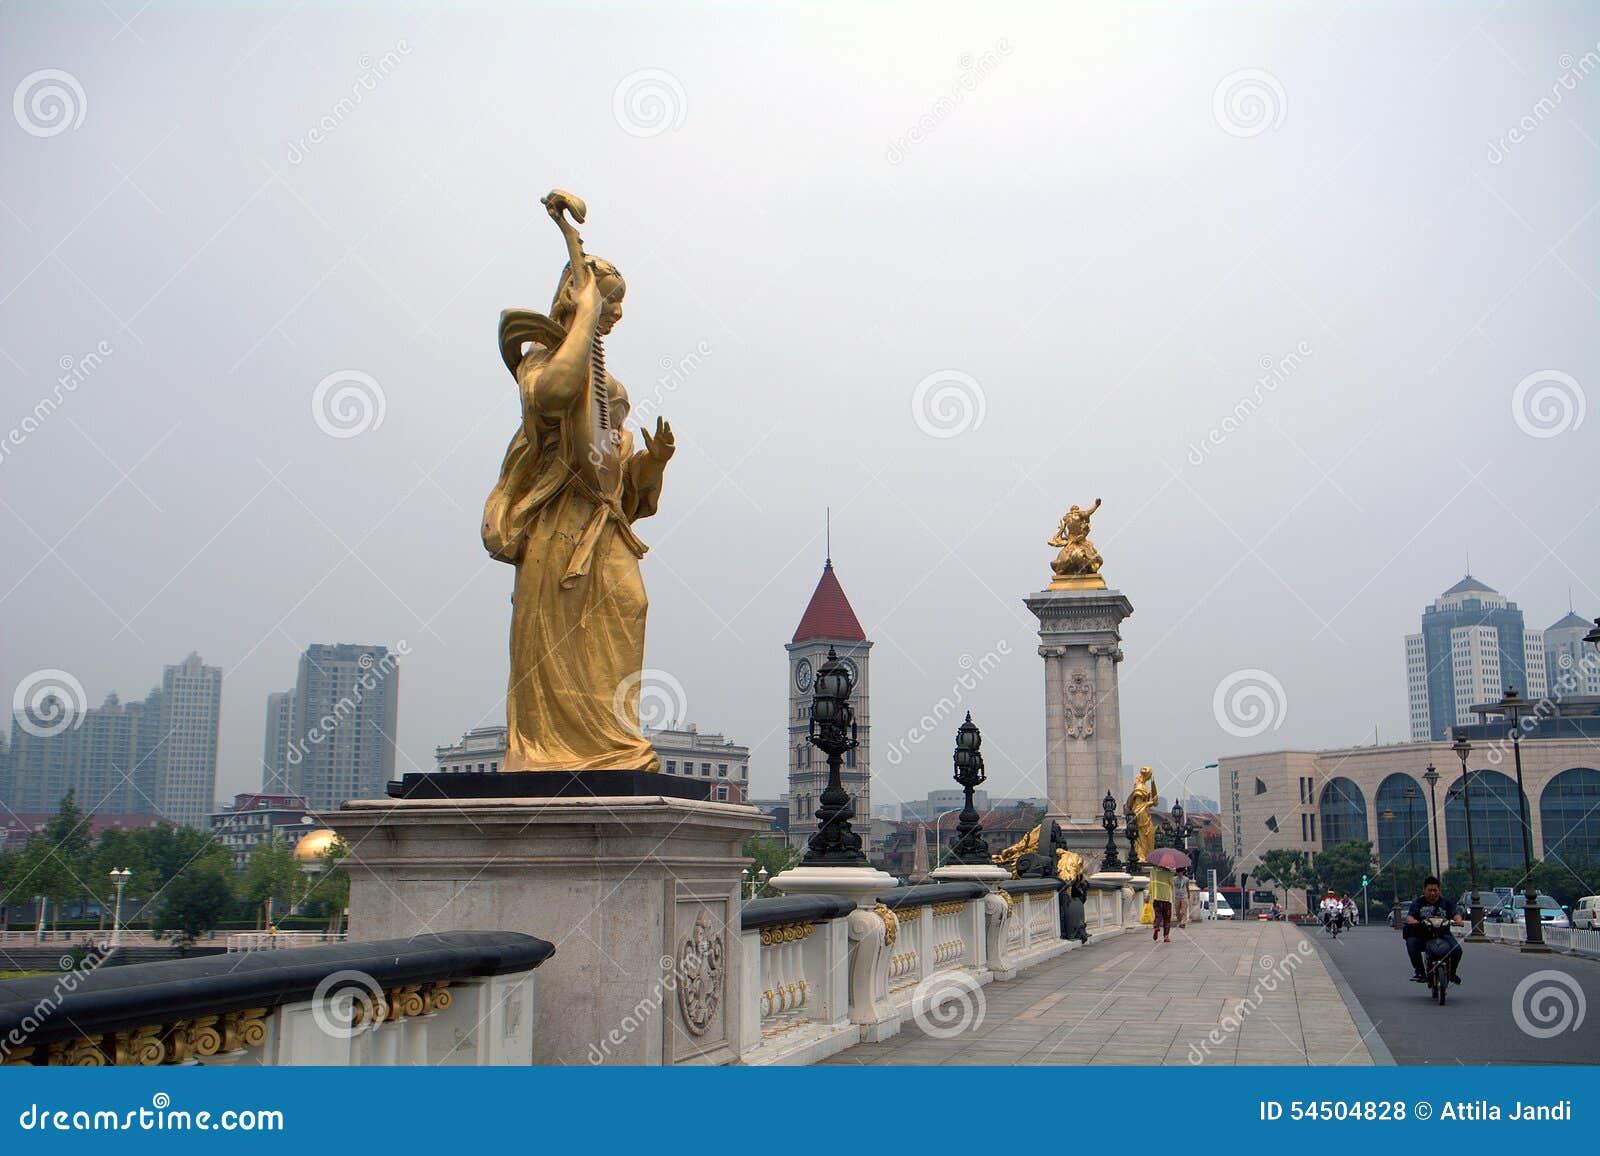 Pont austro-hongrois, Tianjin, Chine